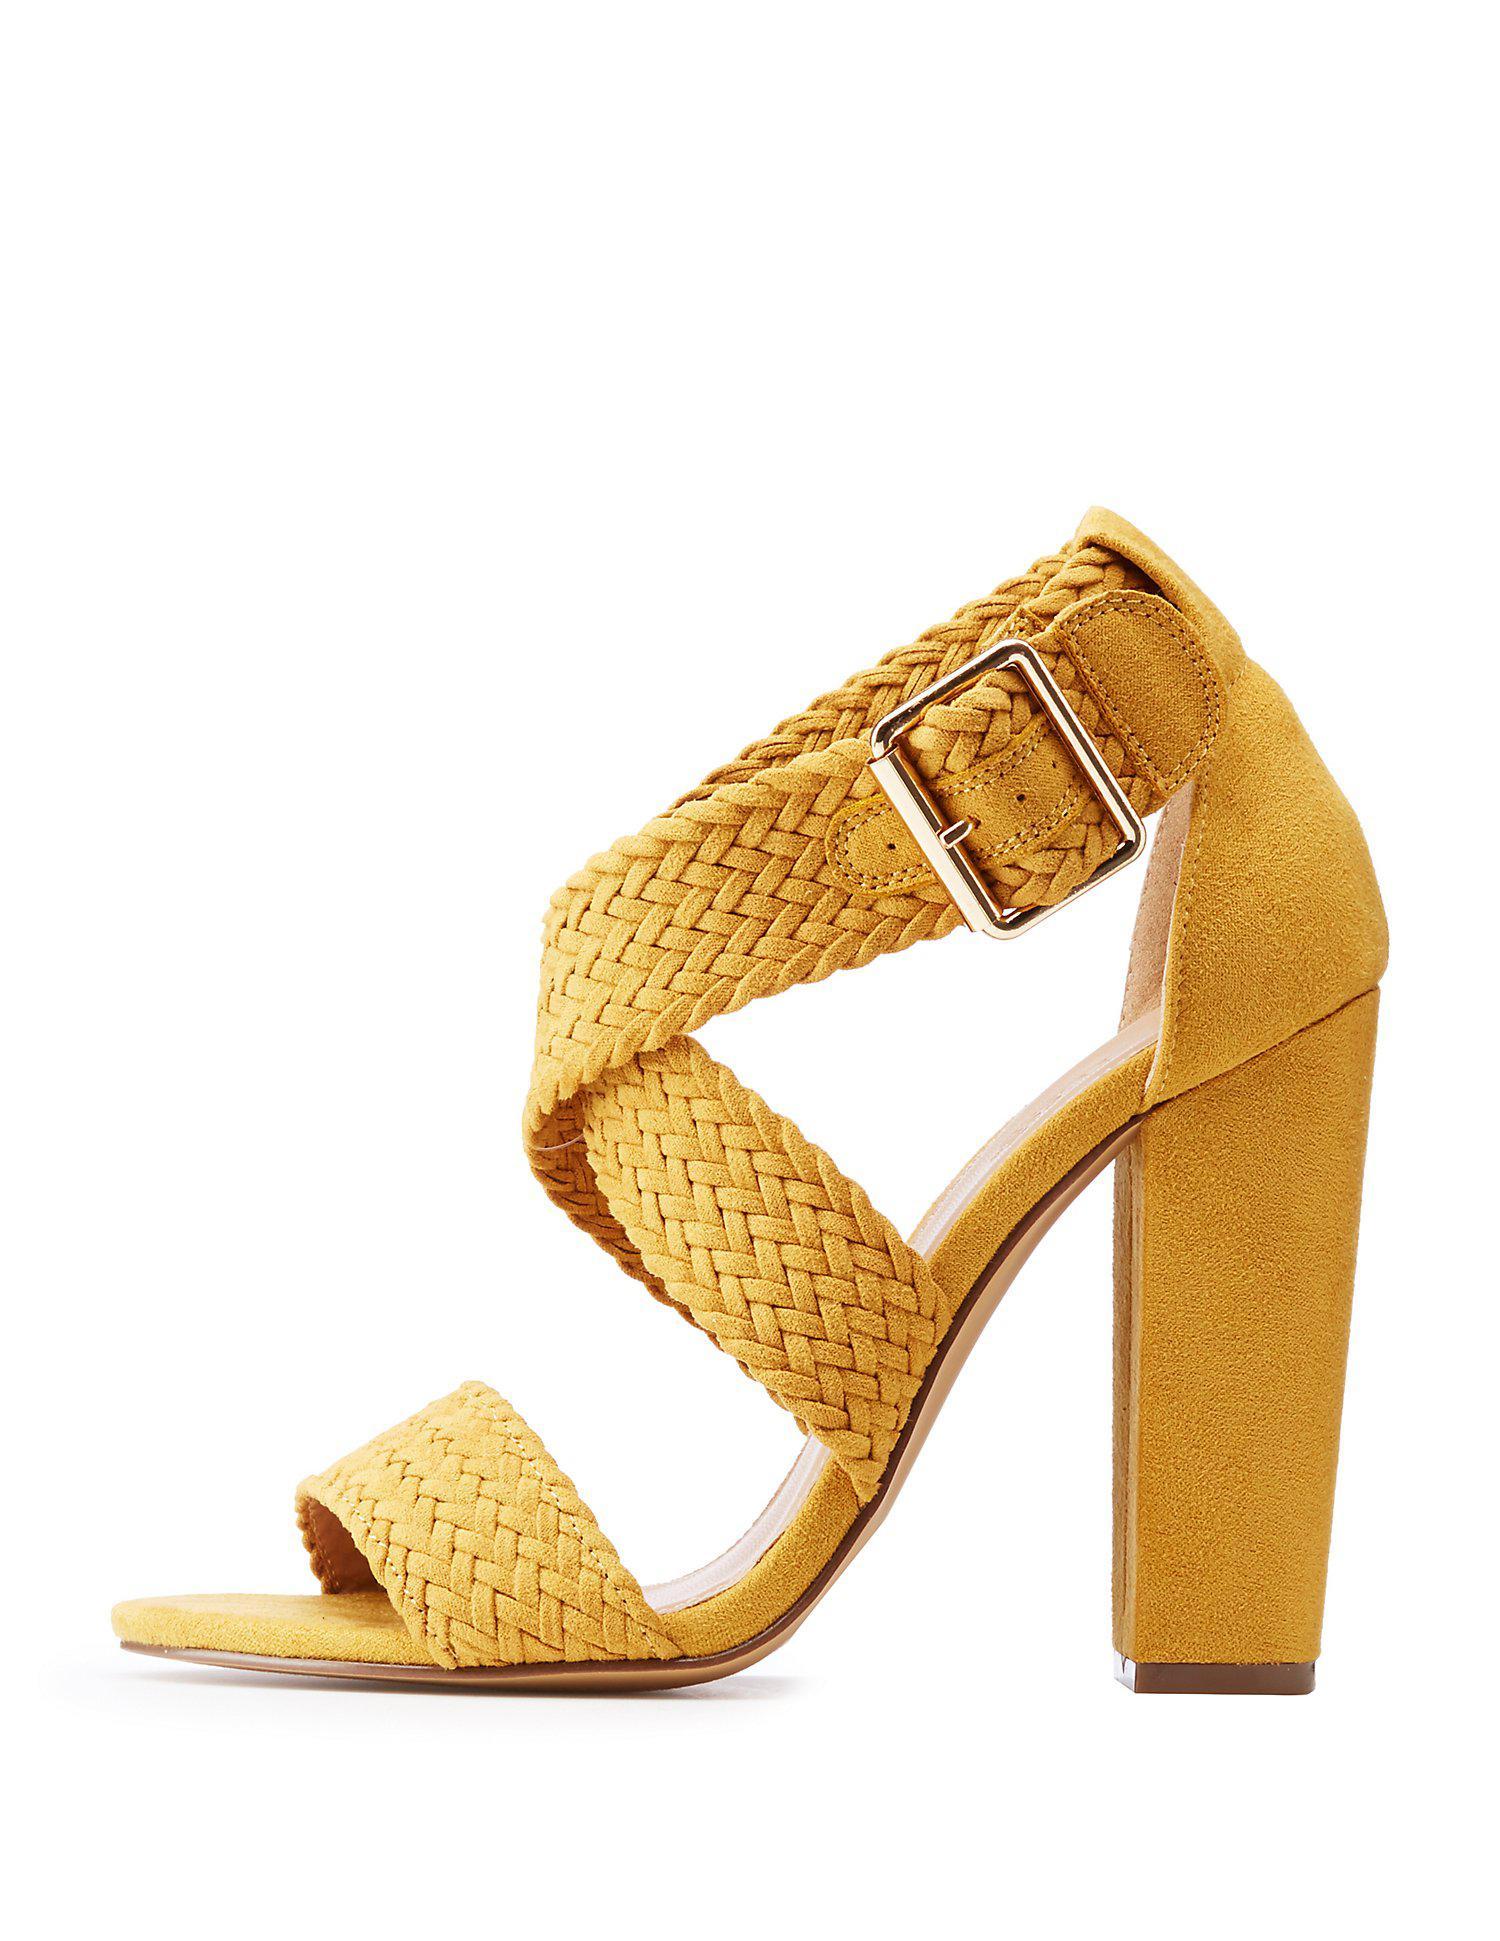 14dd2c164b14 Lyst - Charlotte Russe Braided Crisscross Heel Sandals